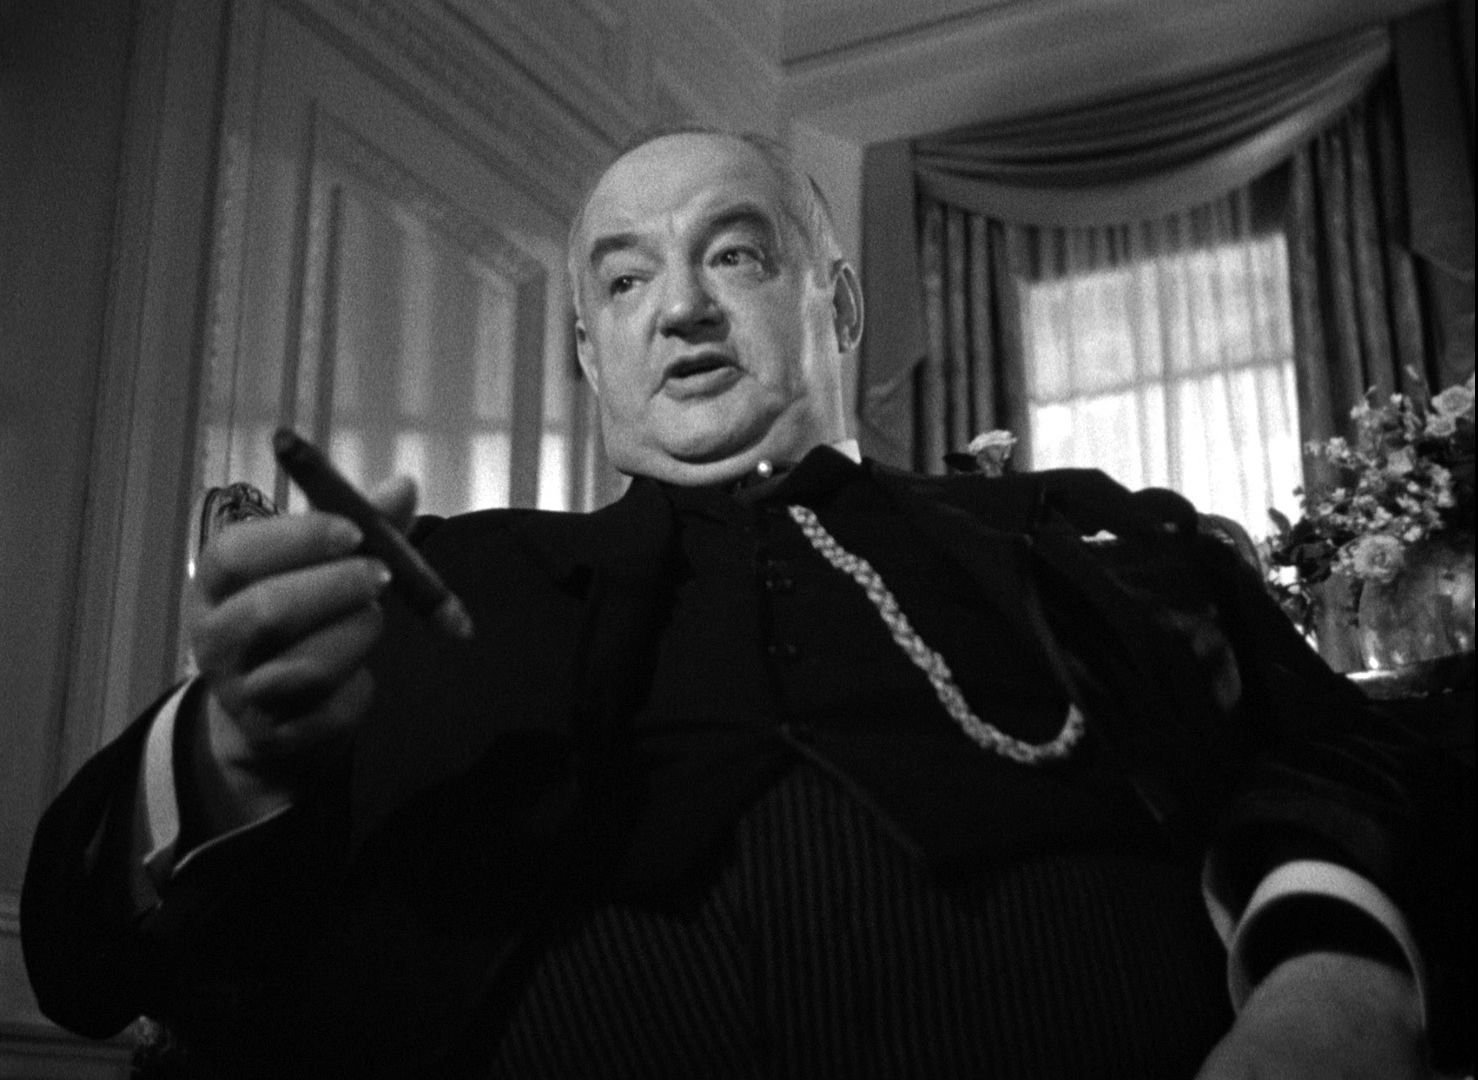 Sydney Greenstreet Movies The Maltese Falcon (1941